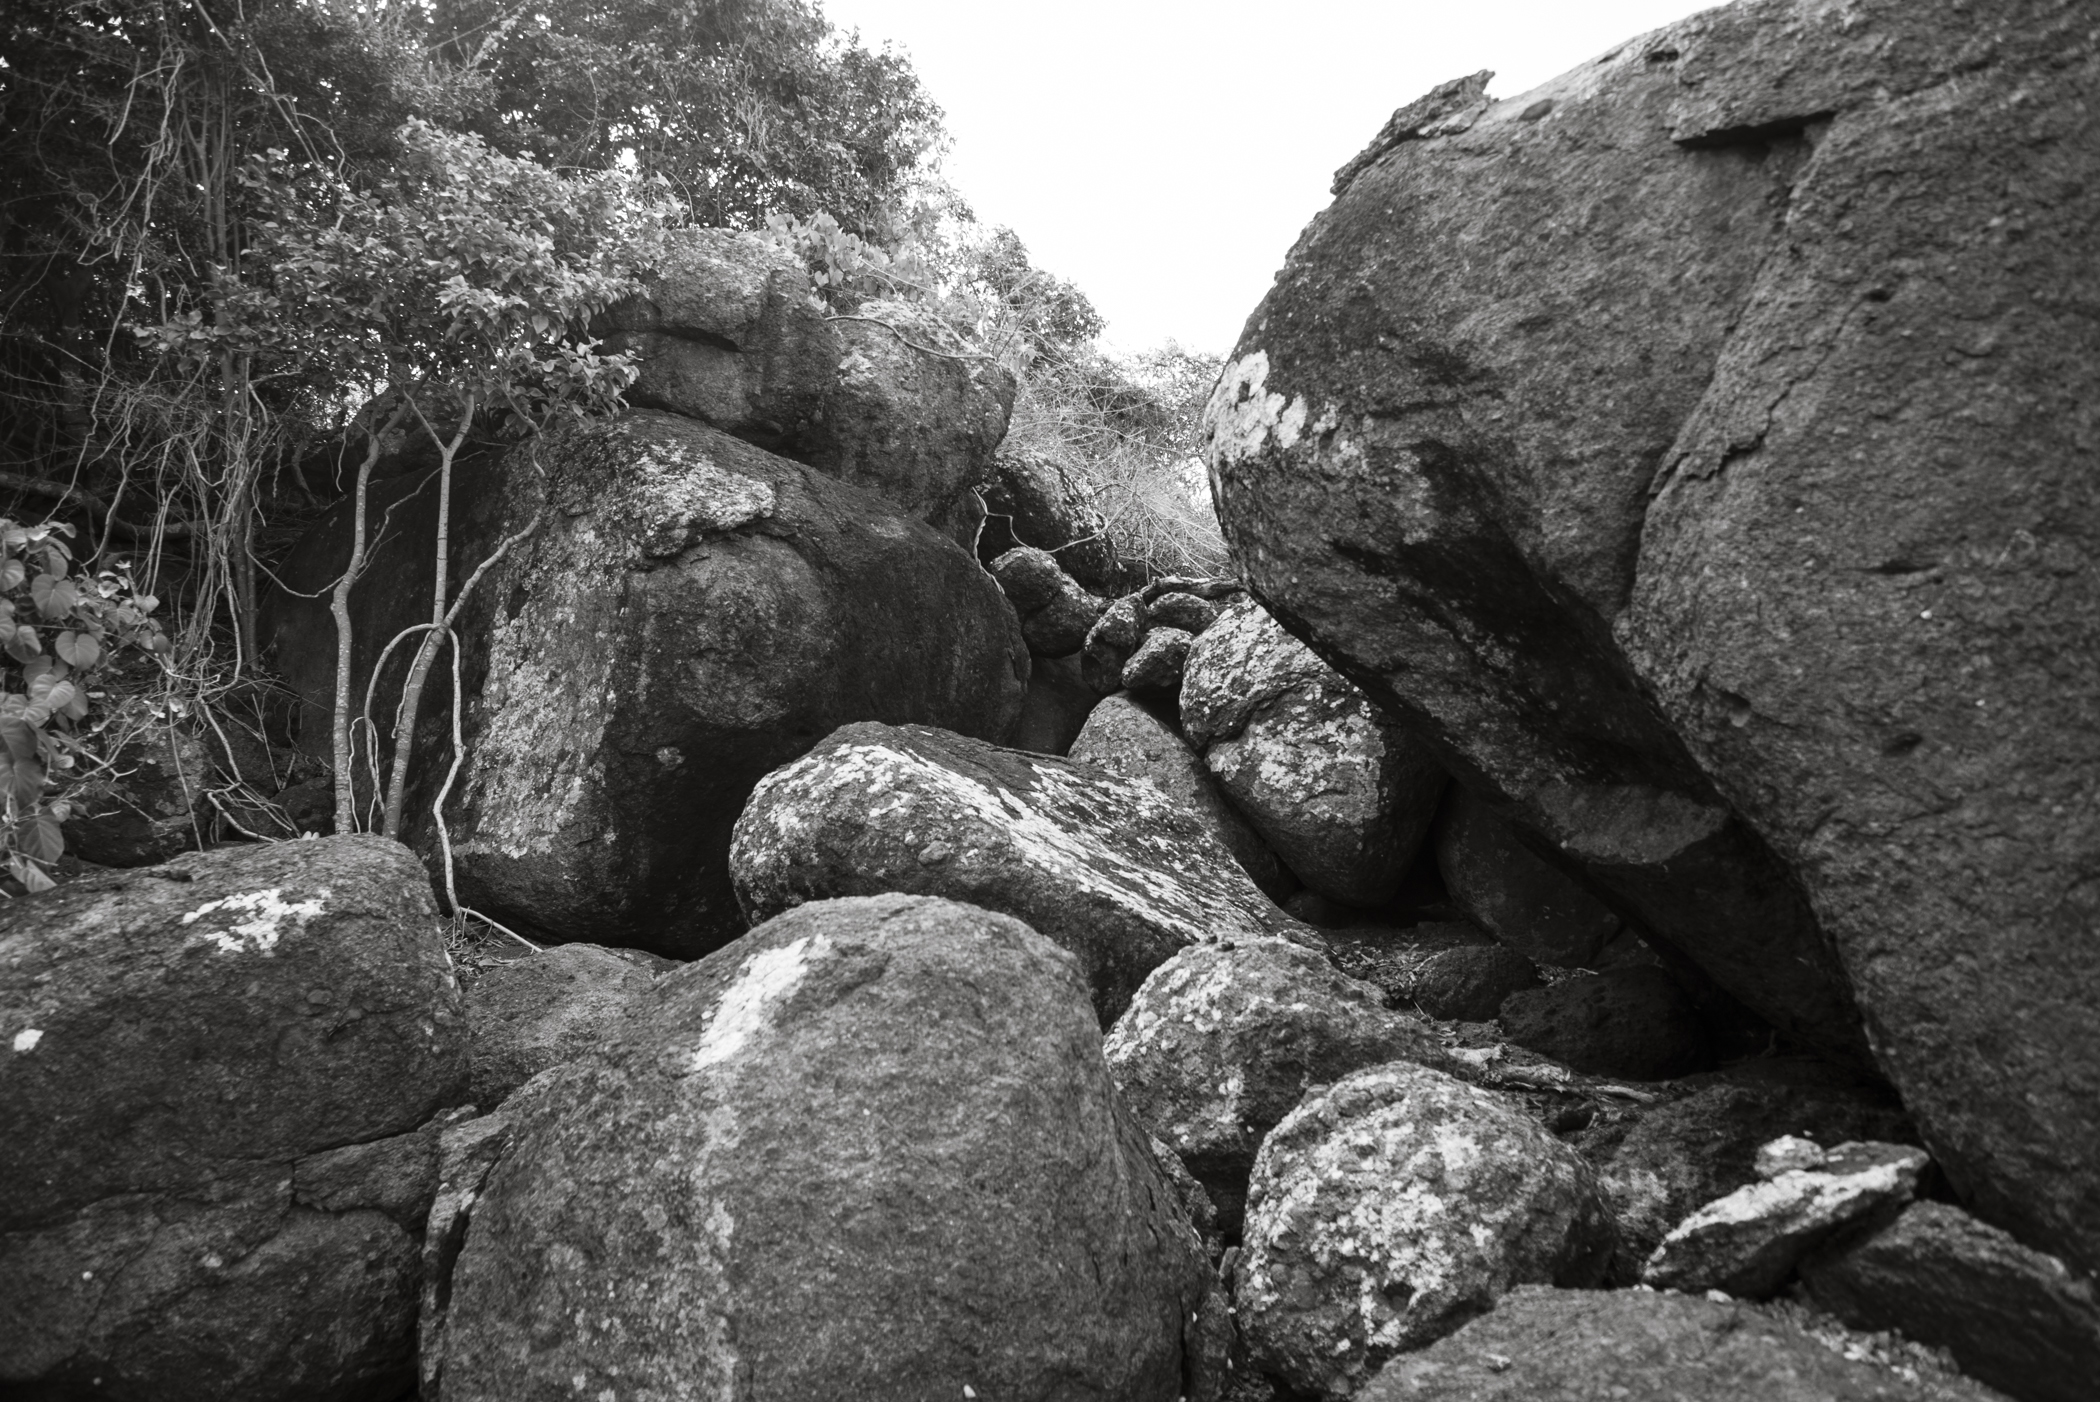 012014-Culebra-JuliaLuckettPhotography-68